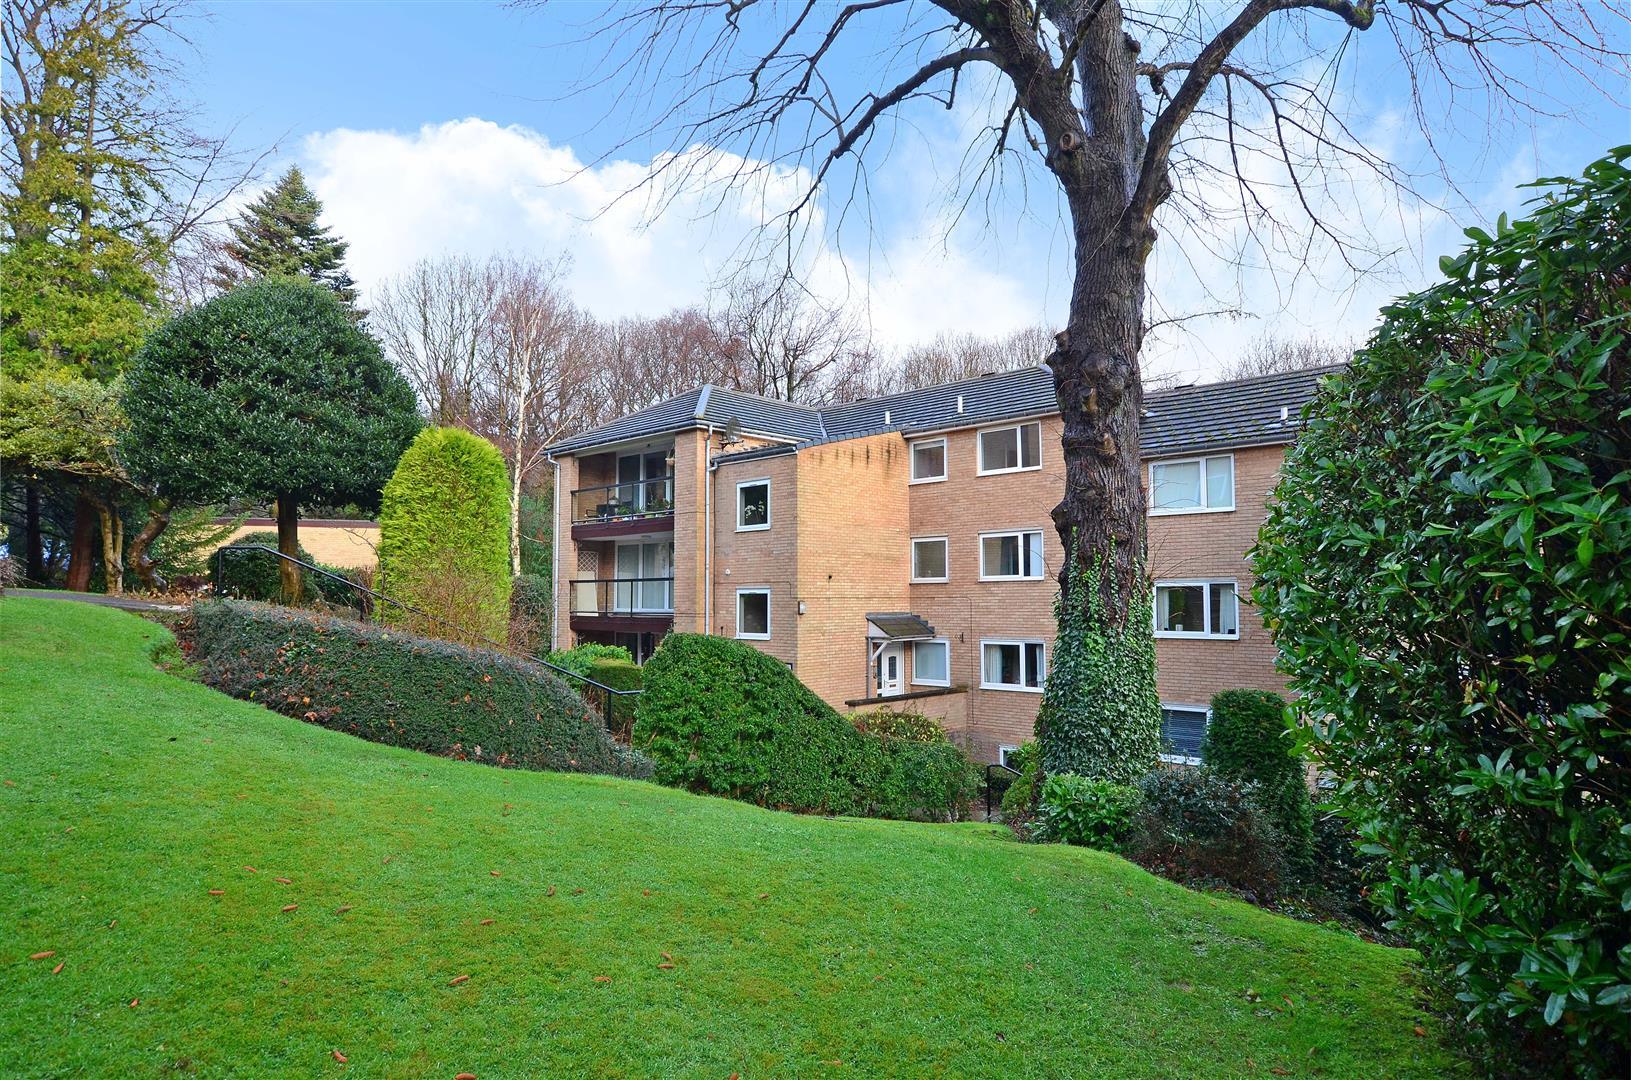 21 Dalebrook Court Belgrave Road Ranmoor Sheffield